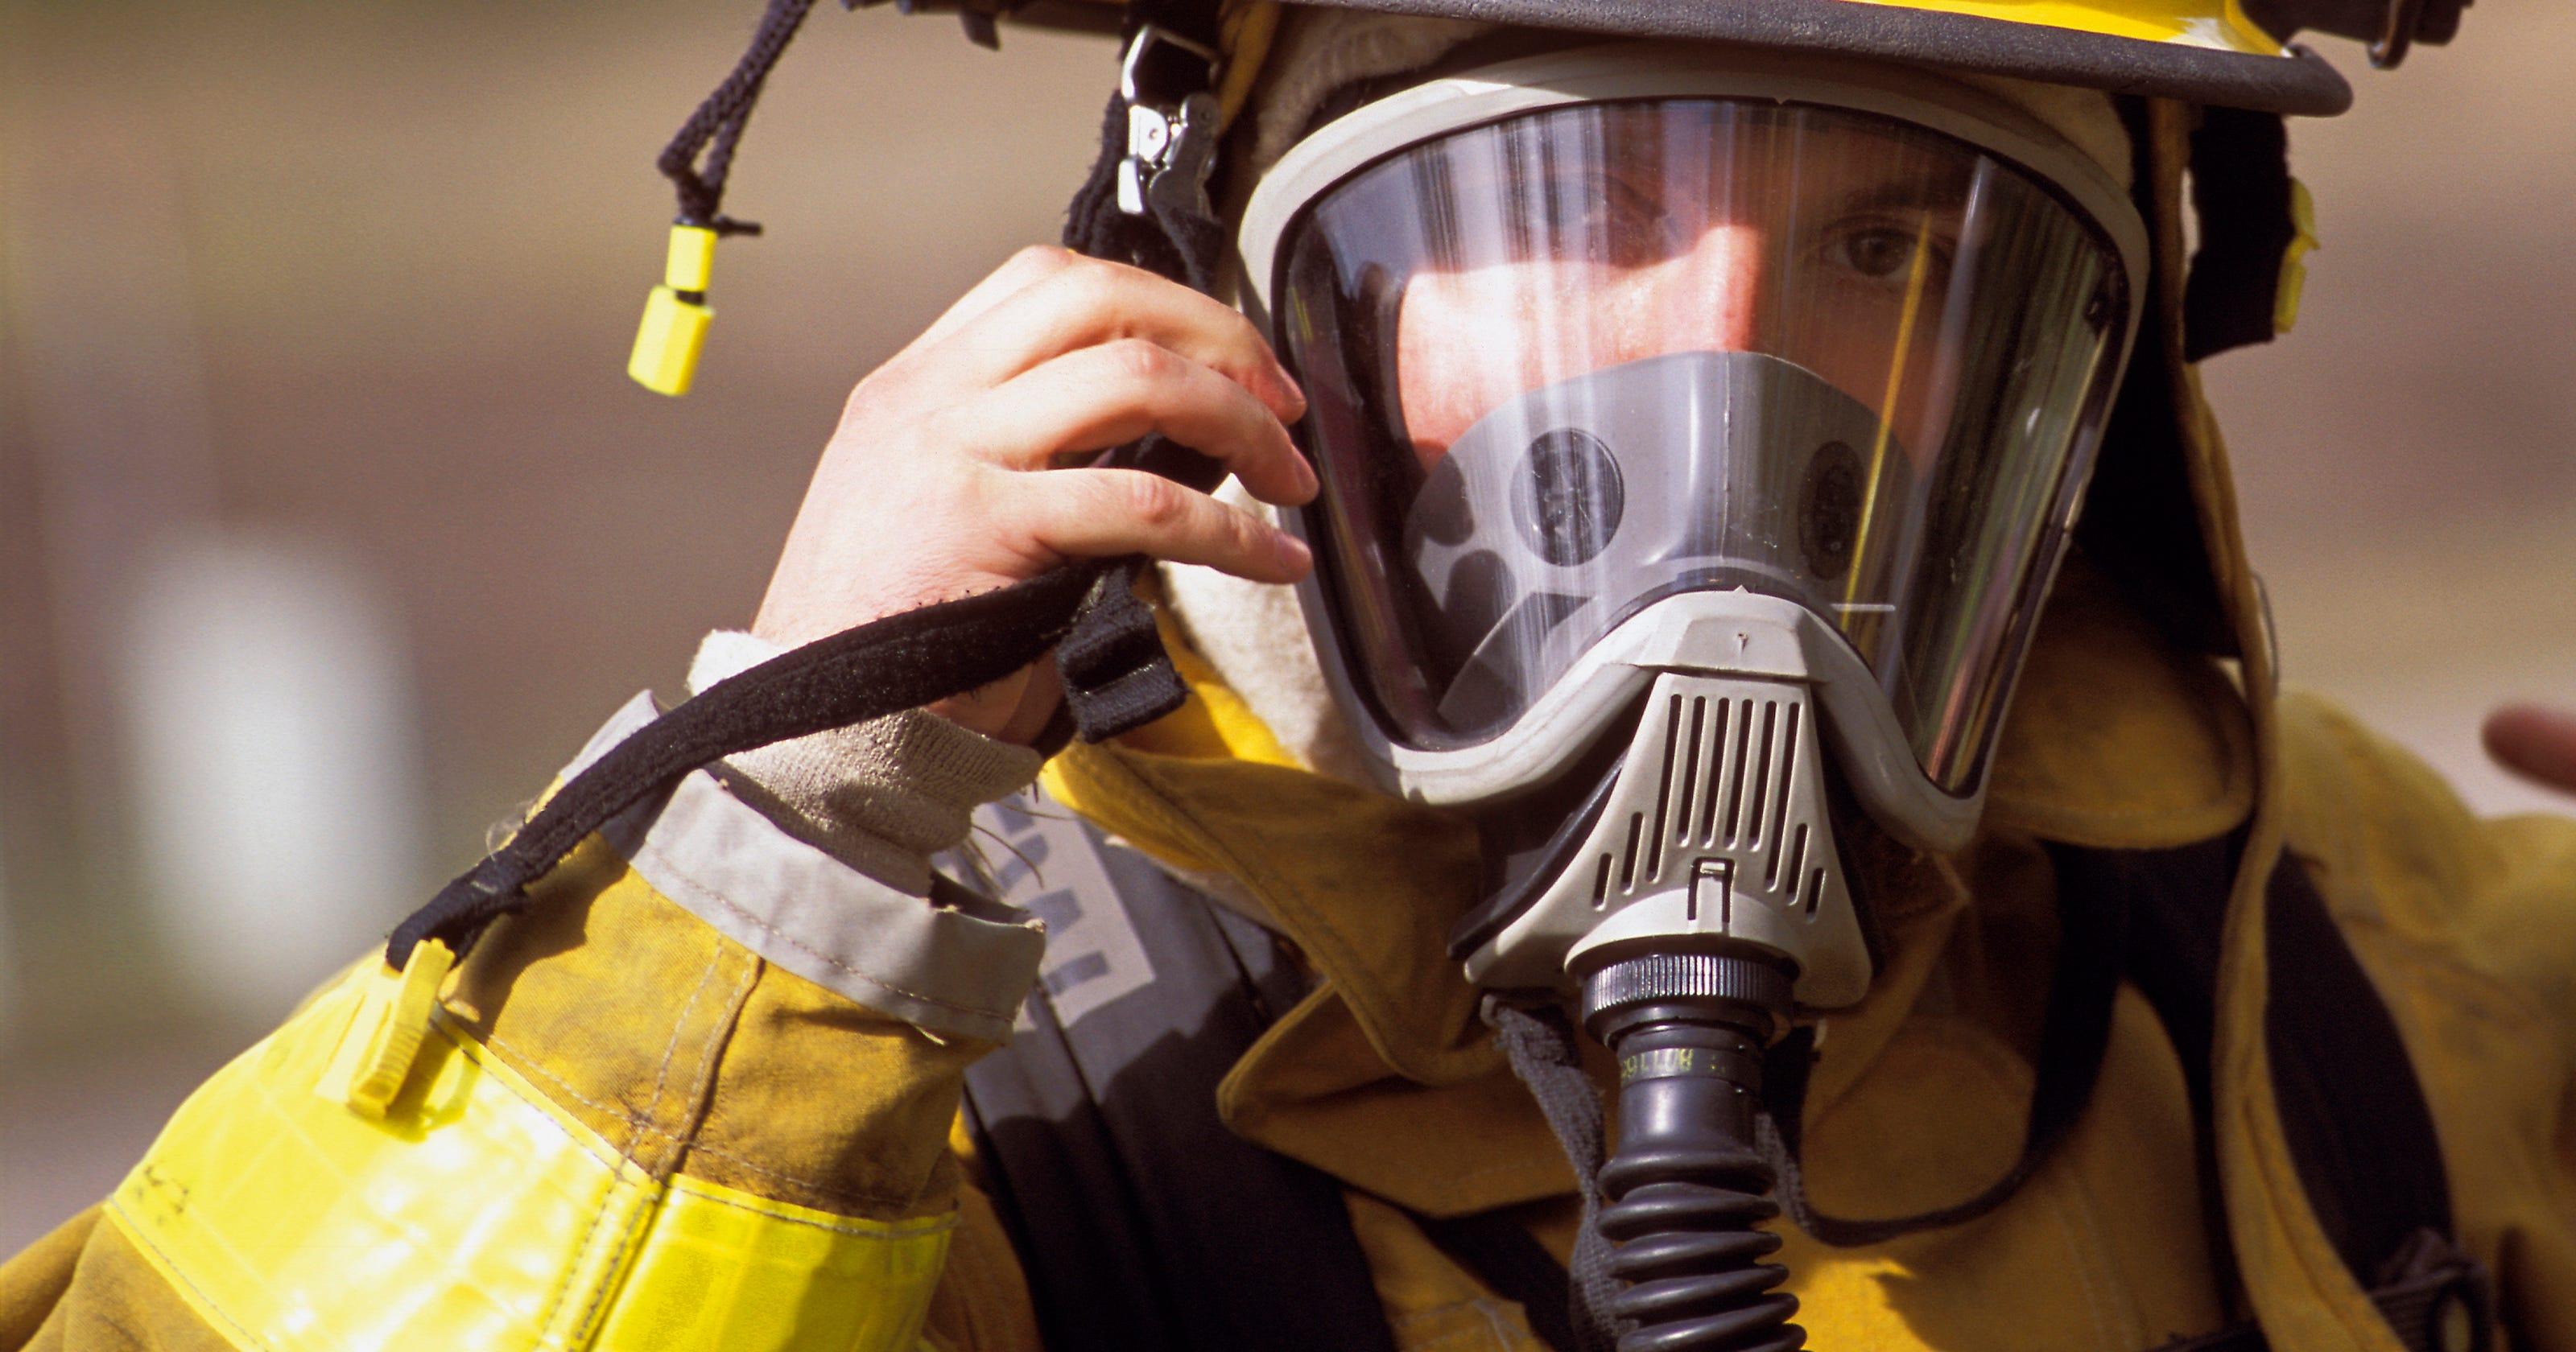 Hazardous material spurs evacuation at Oxnard business - Ventura County Star thumbnail